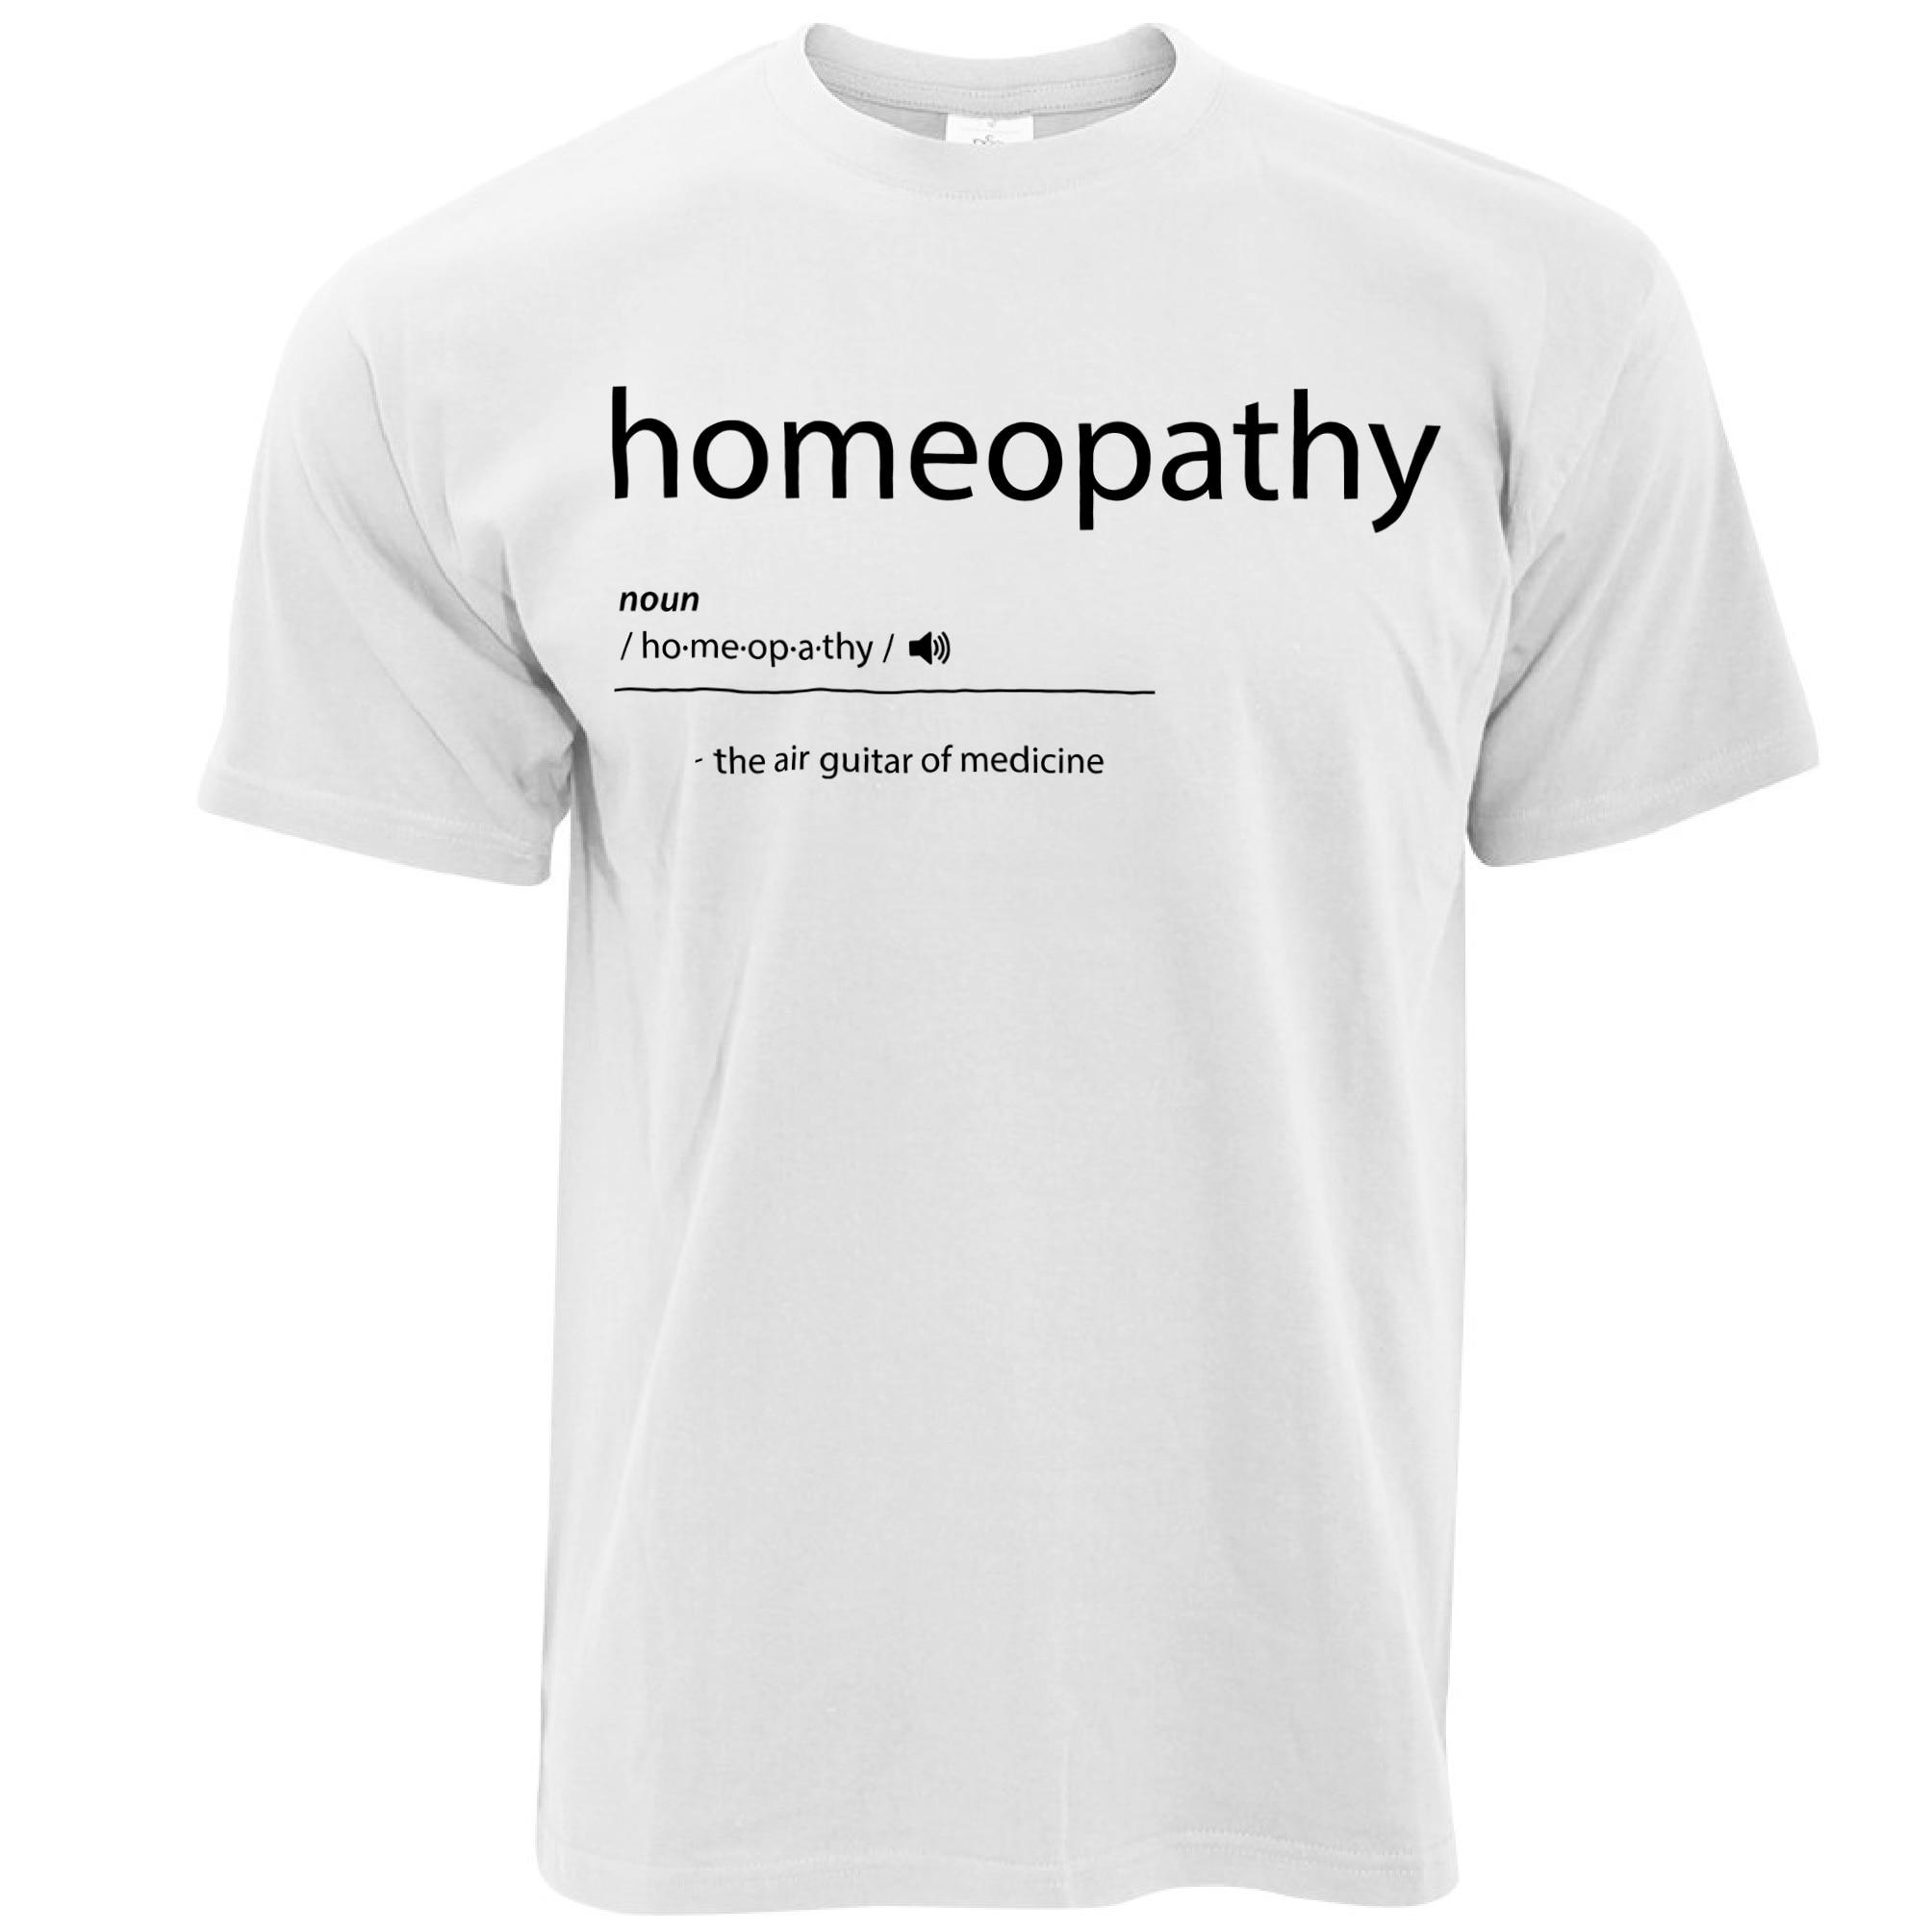 Buy medicin t shirt and get free shipping on AliExpress.com